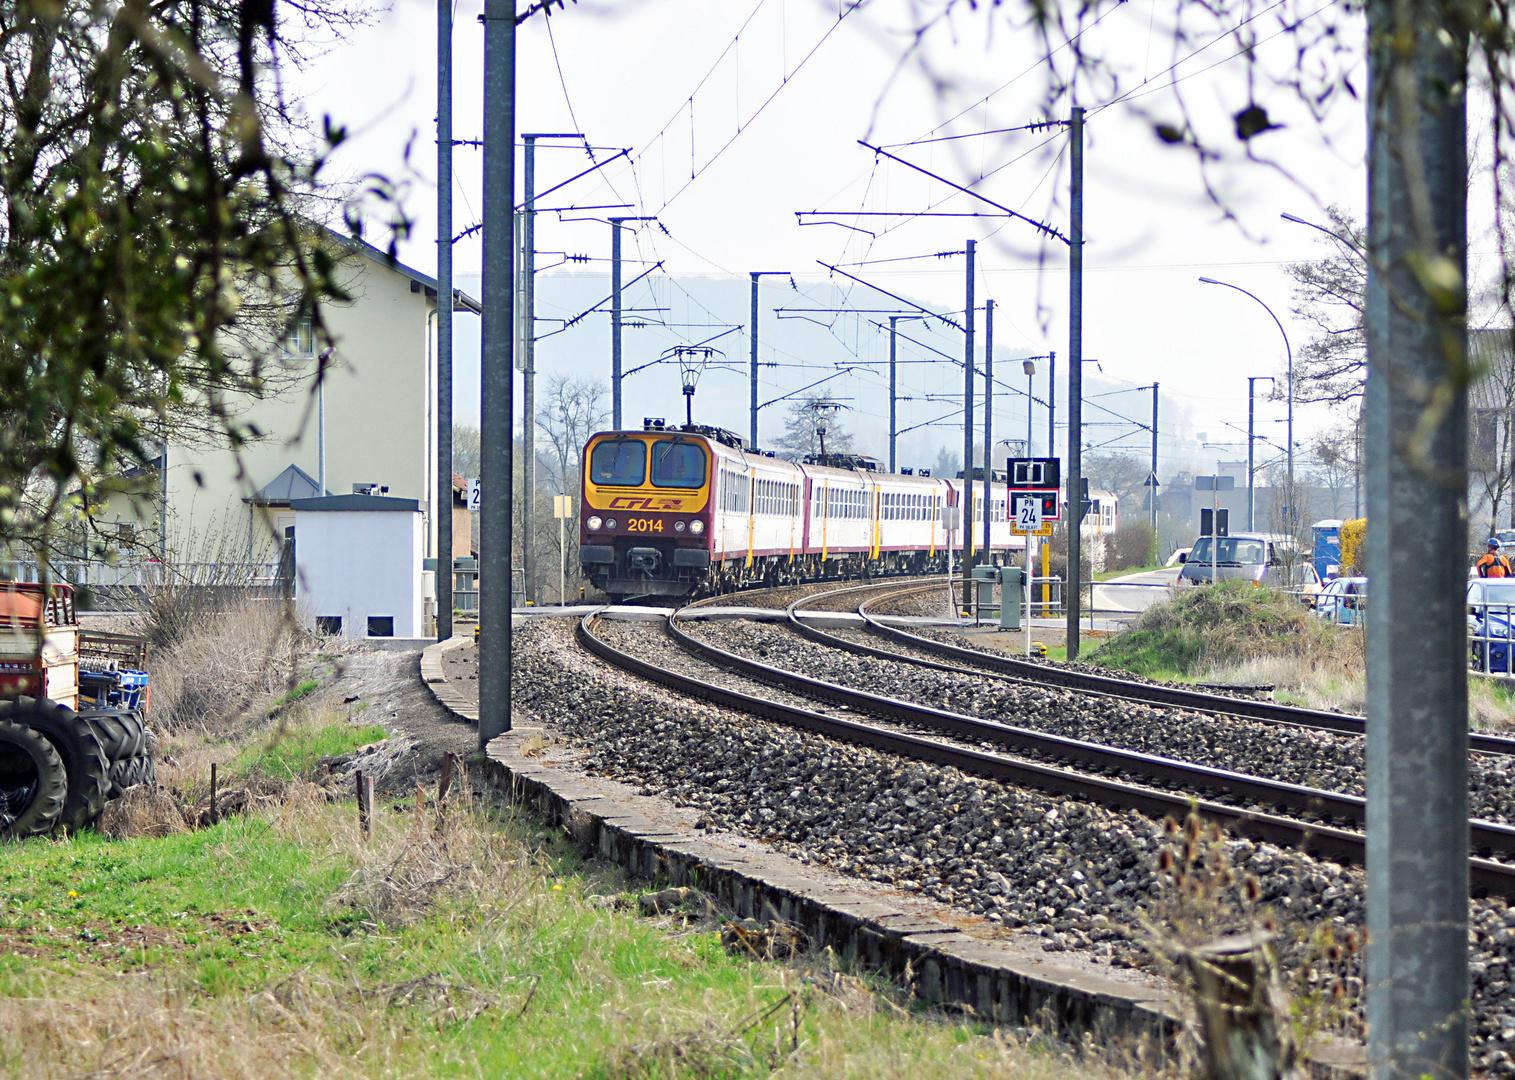 CFL 2014 in Pettingen/Mersch Part I